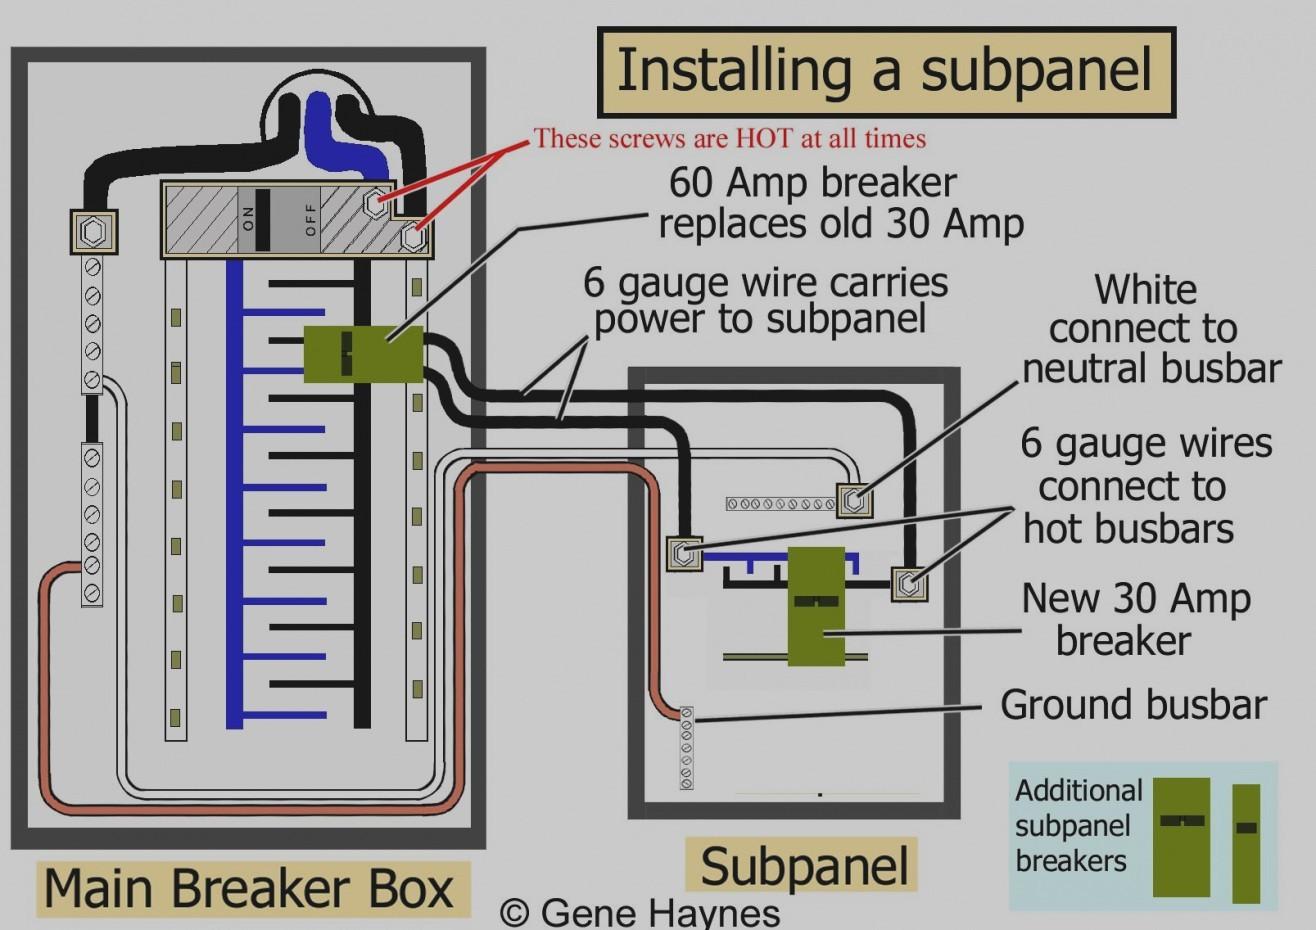 220 sub panel wiring diagram free image about wiring diagram rh daniablub co